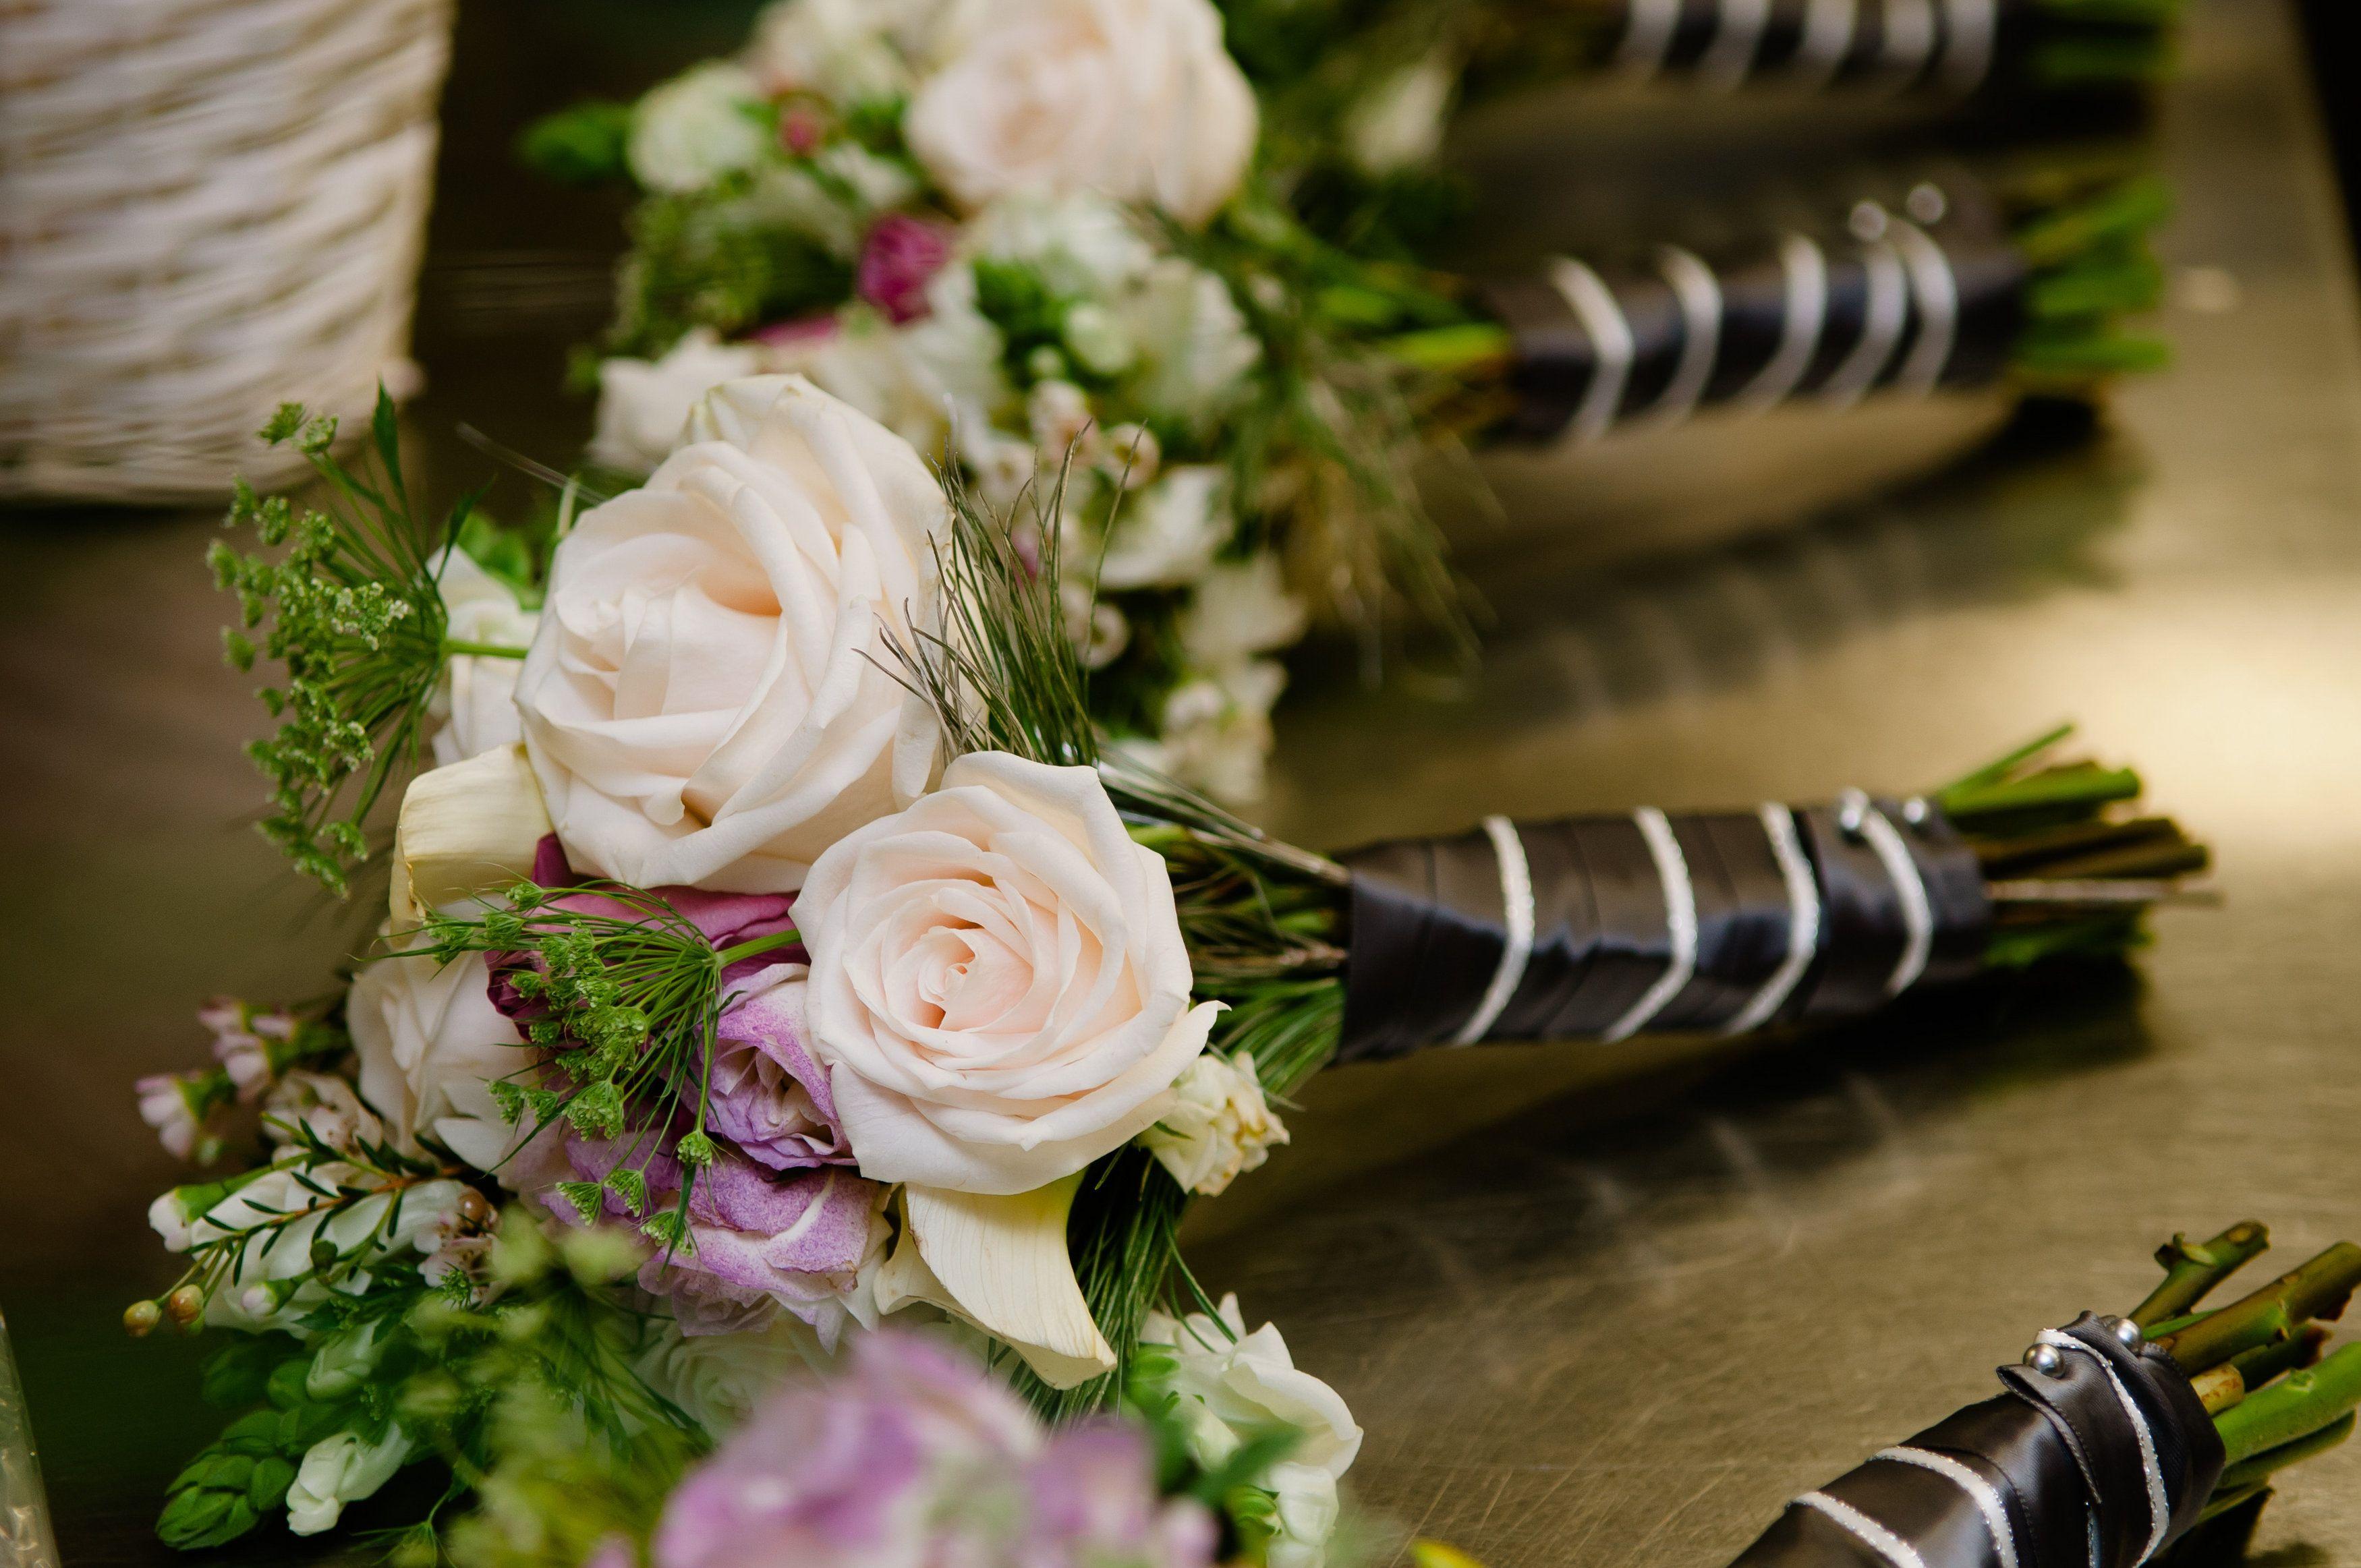 #BridesmaidBouquet #WeddingFlowers #WinterWedding See more pictures at http://eileenkphoto.com/2014/01/kelsijoe-married-minneapolis-boulevard-hotel/